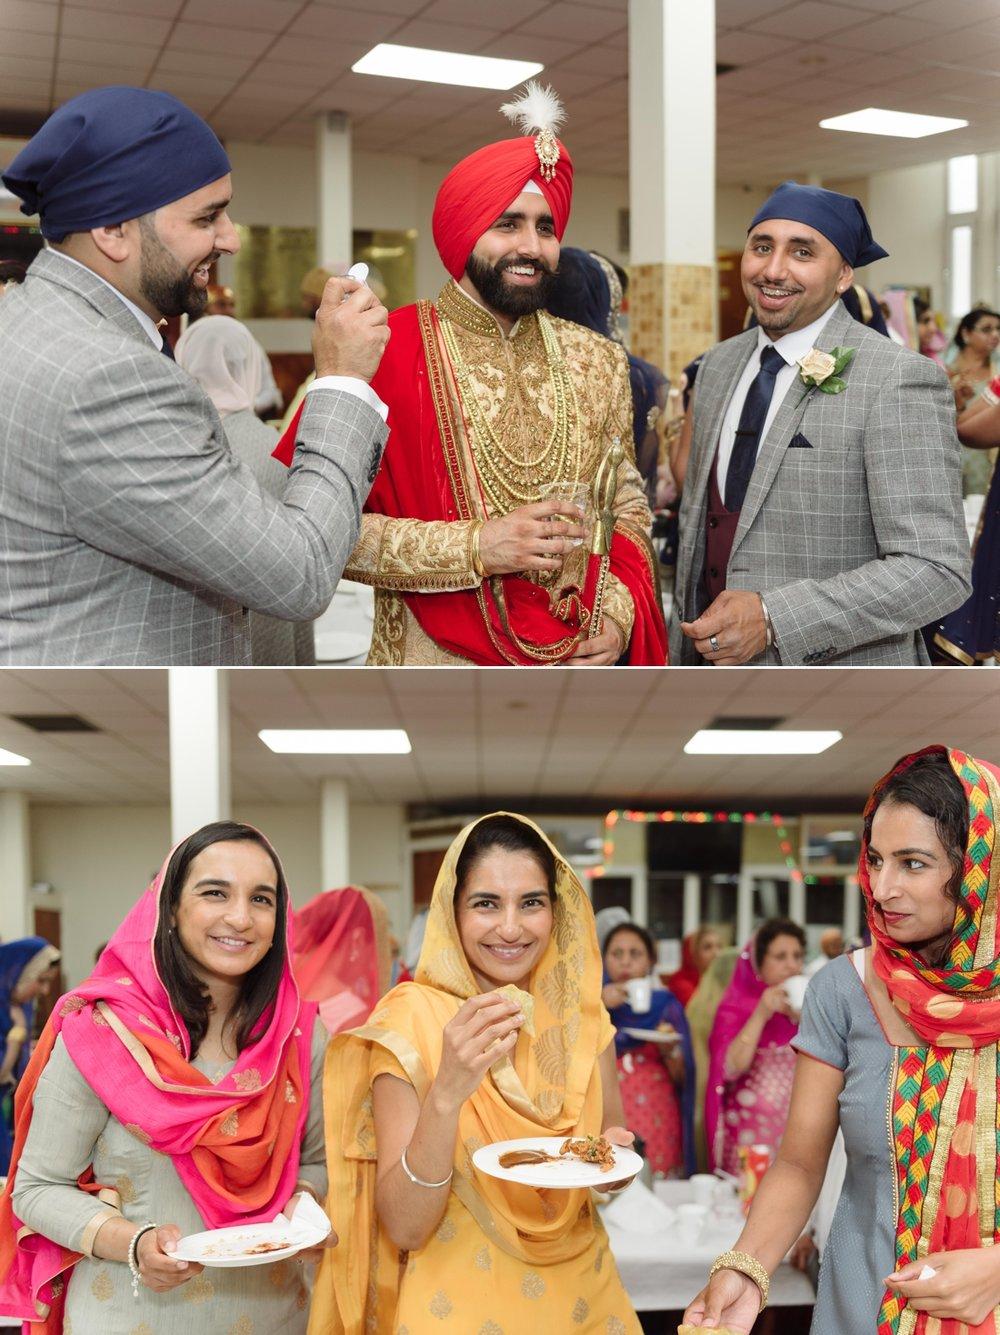 Gurpreet and Nick Sikh Wedding - Southampton - Photos by Abhi 3.jpg